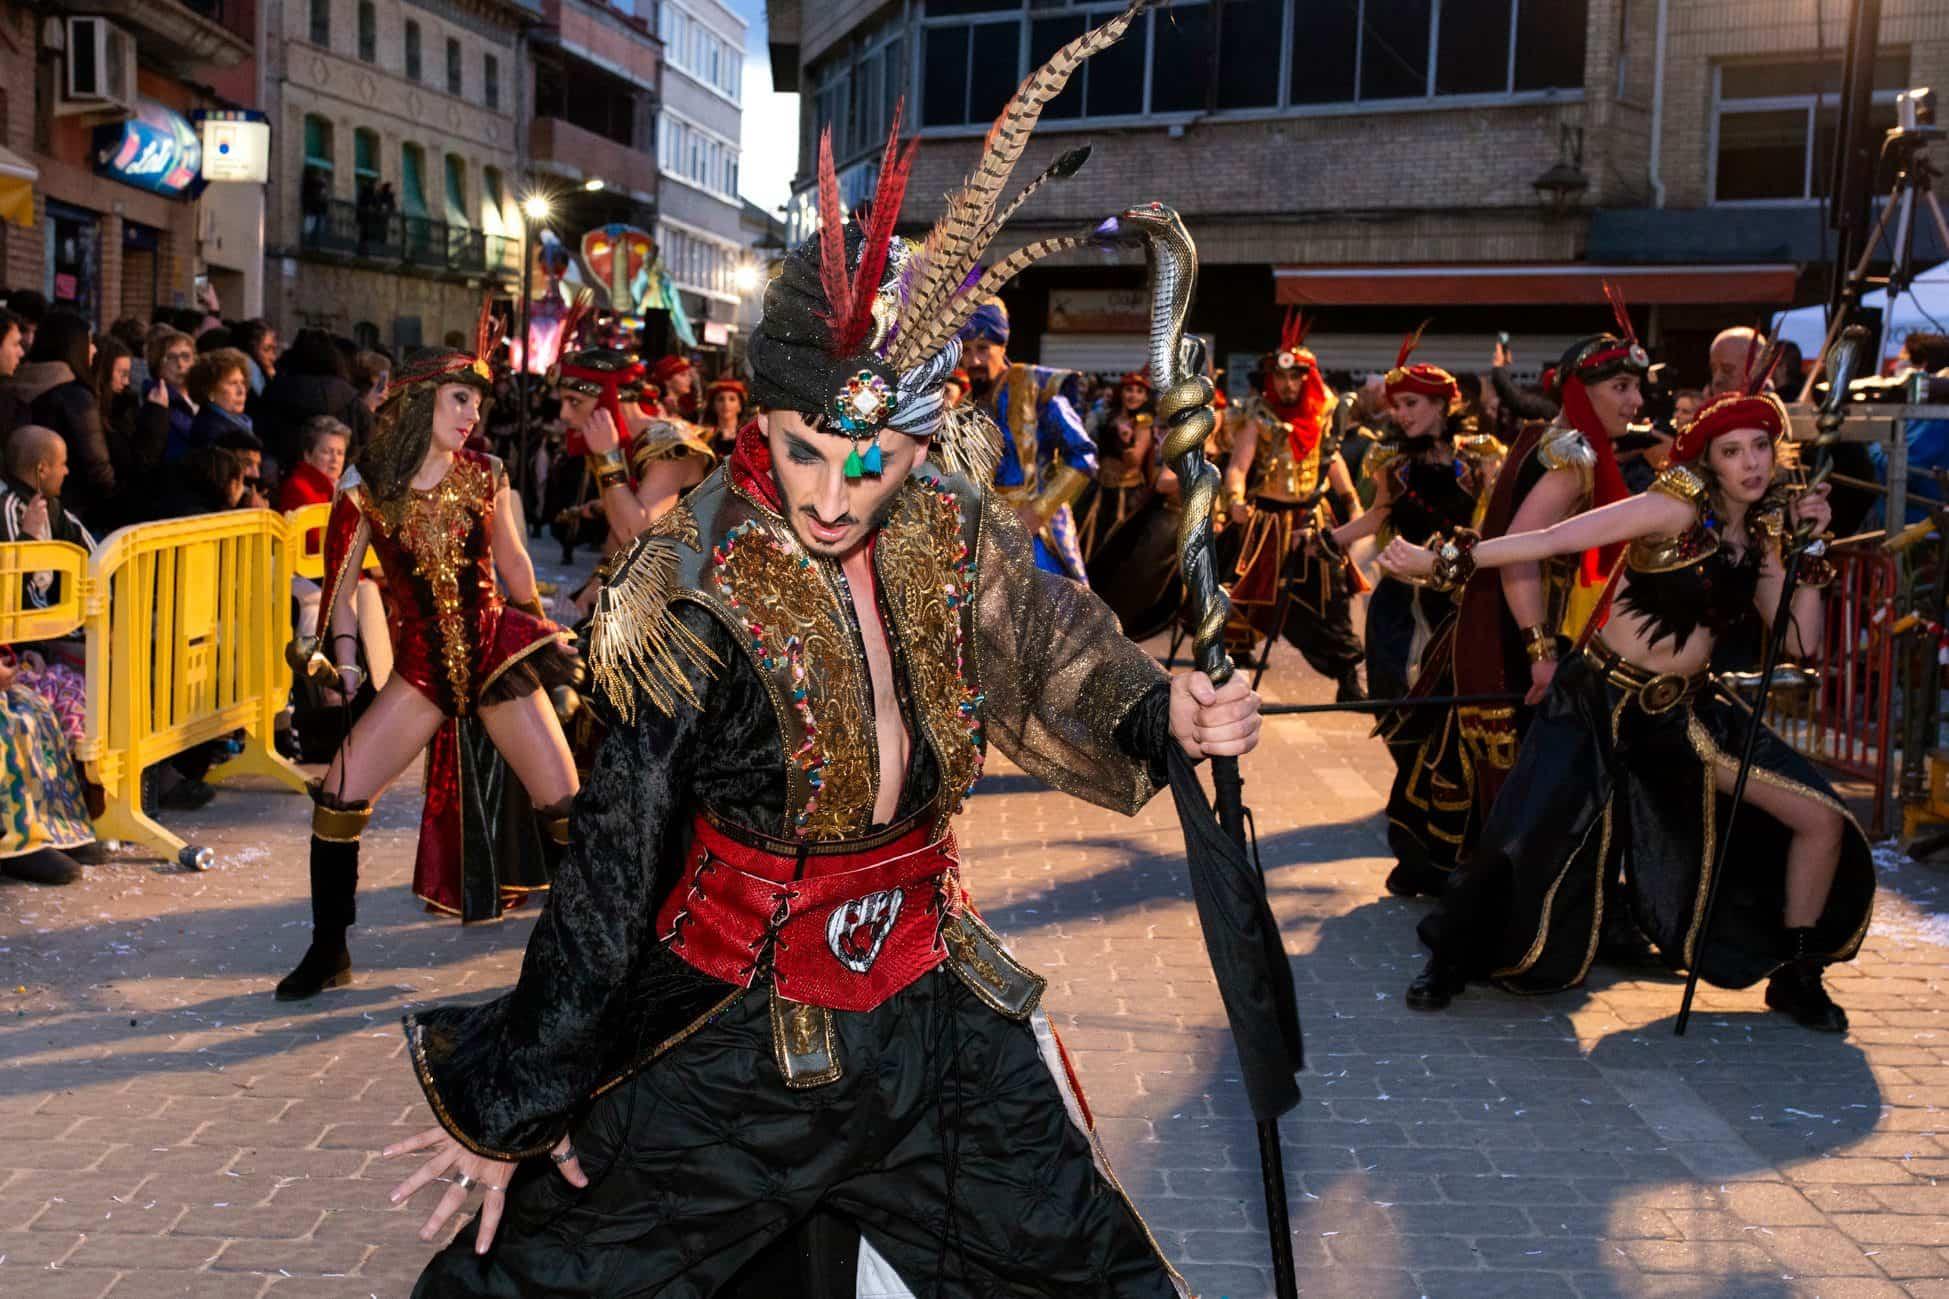 Carnaval de herencia 2020 ofertorio 155 - Selección de fotografías del Ofertorio del Carnaval de Herencia